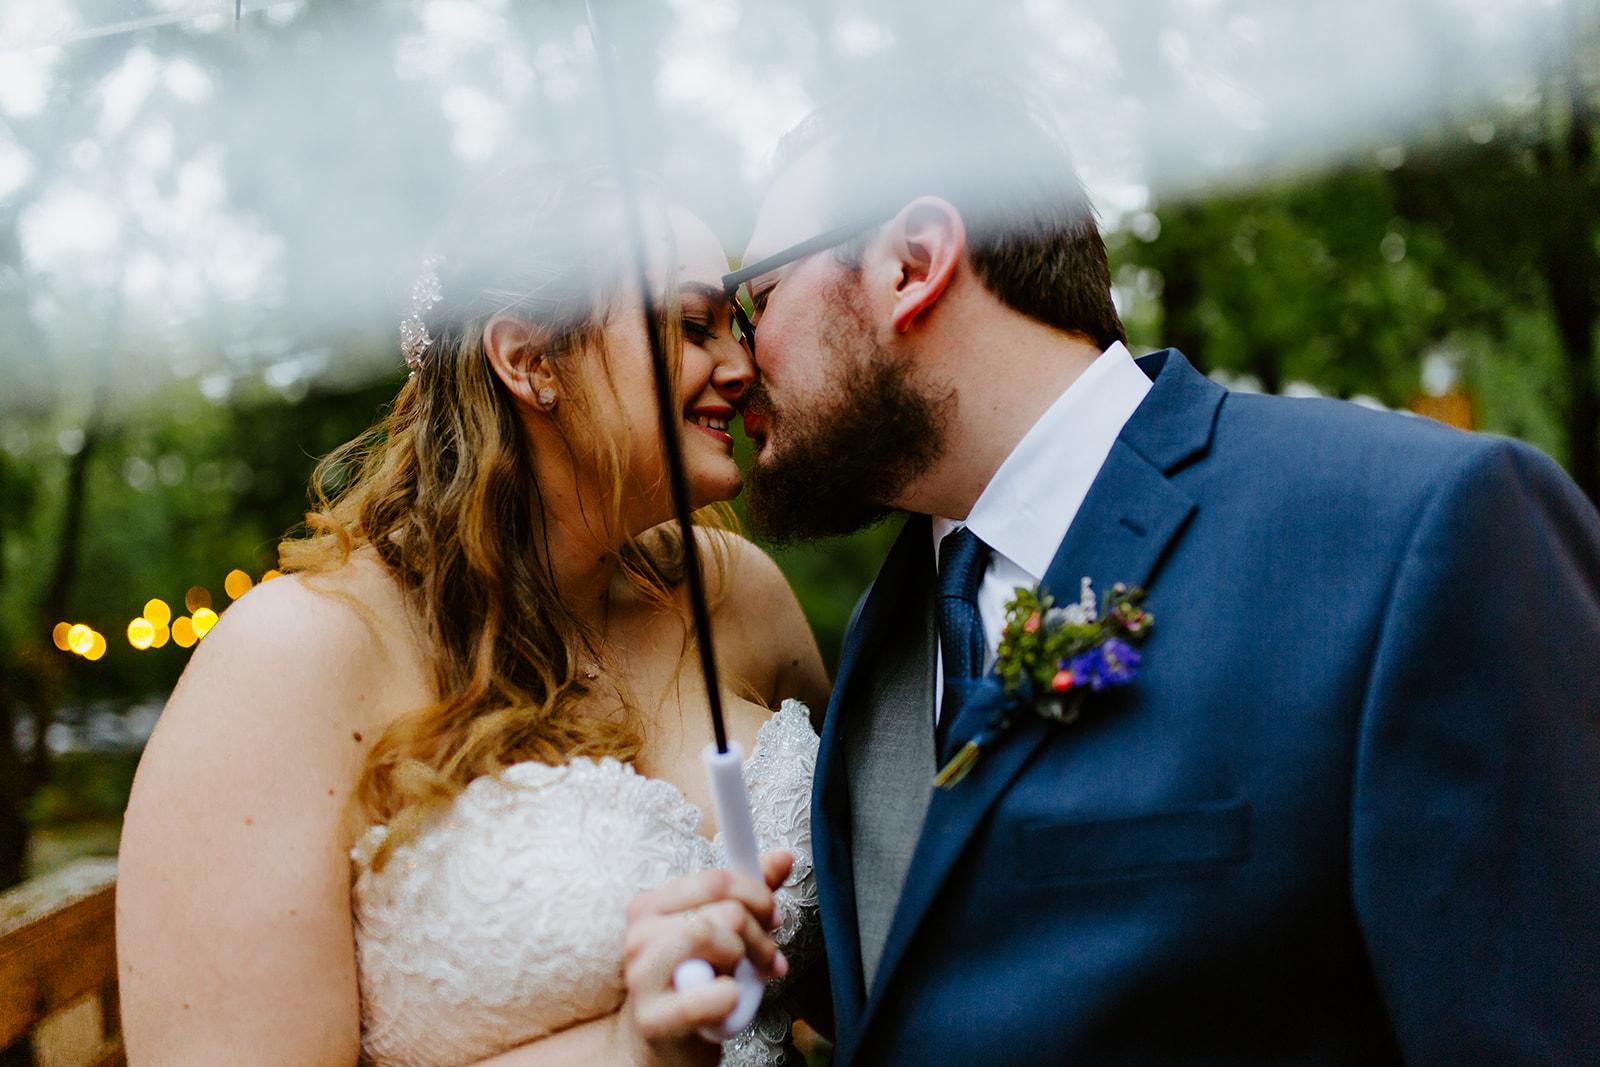 Kristin + Tommy - Wedding Photos - Sneak Peeks! - Meme Urbane Photography_-39_websize.jpg